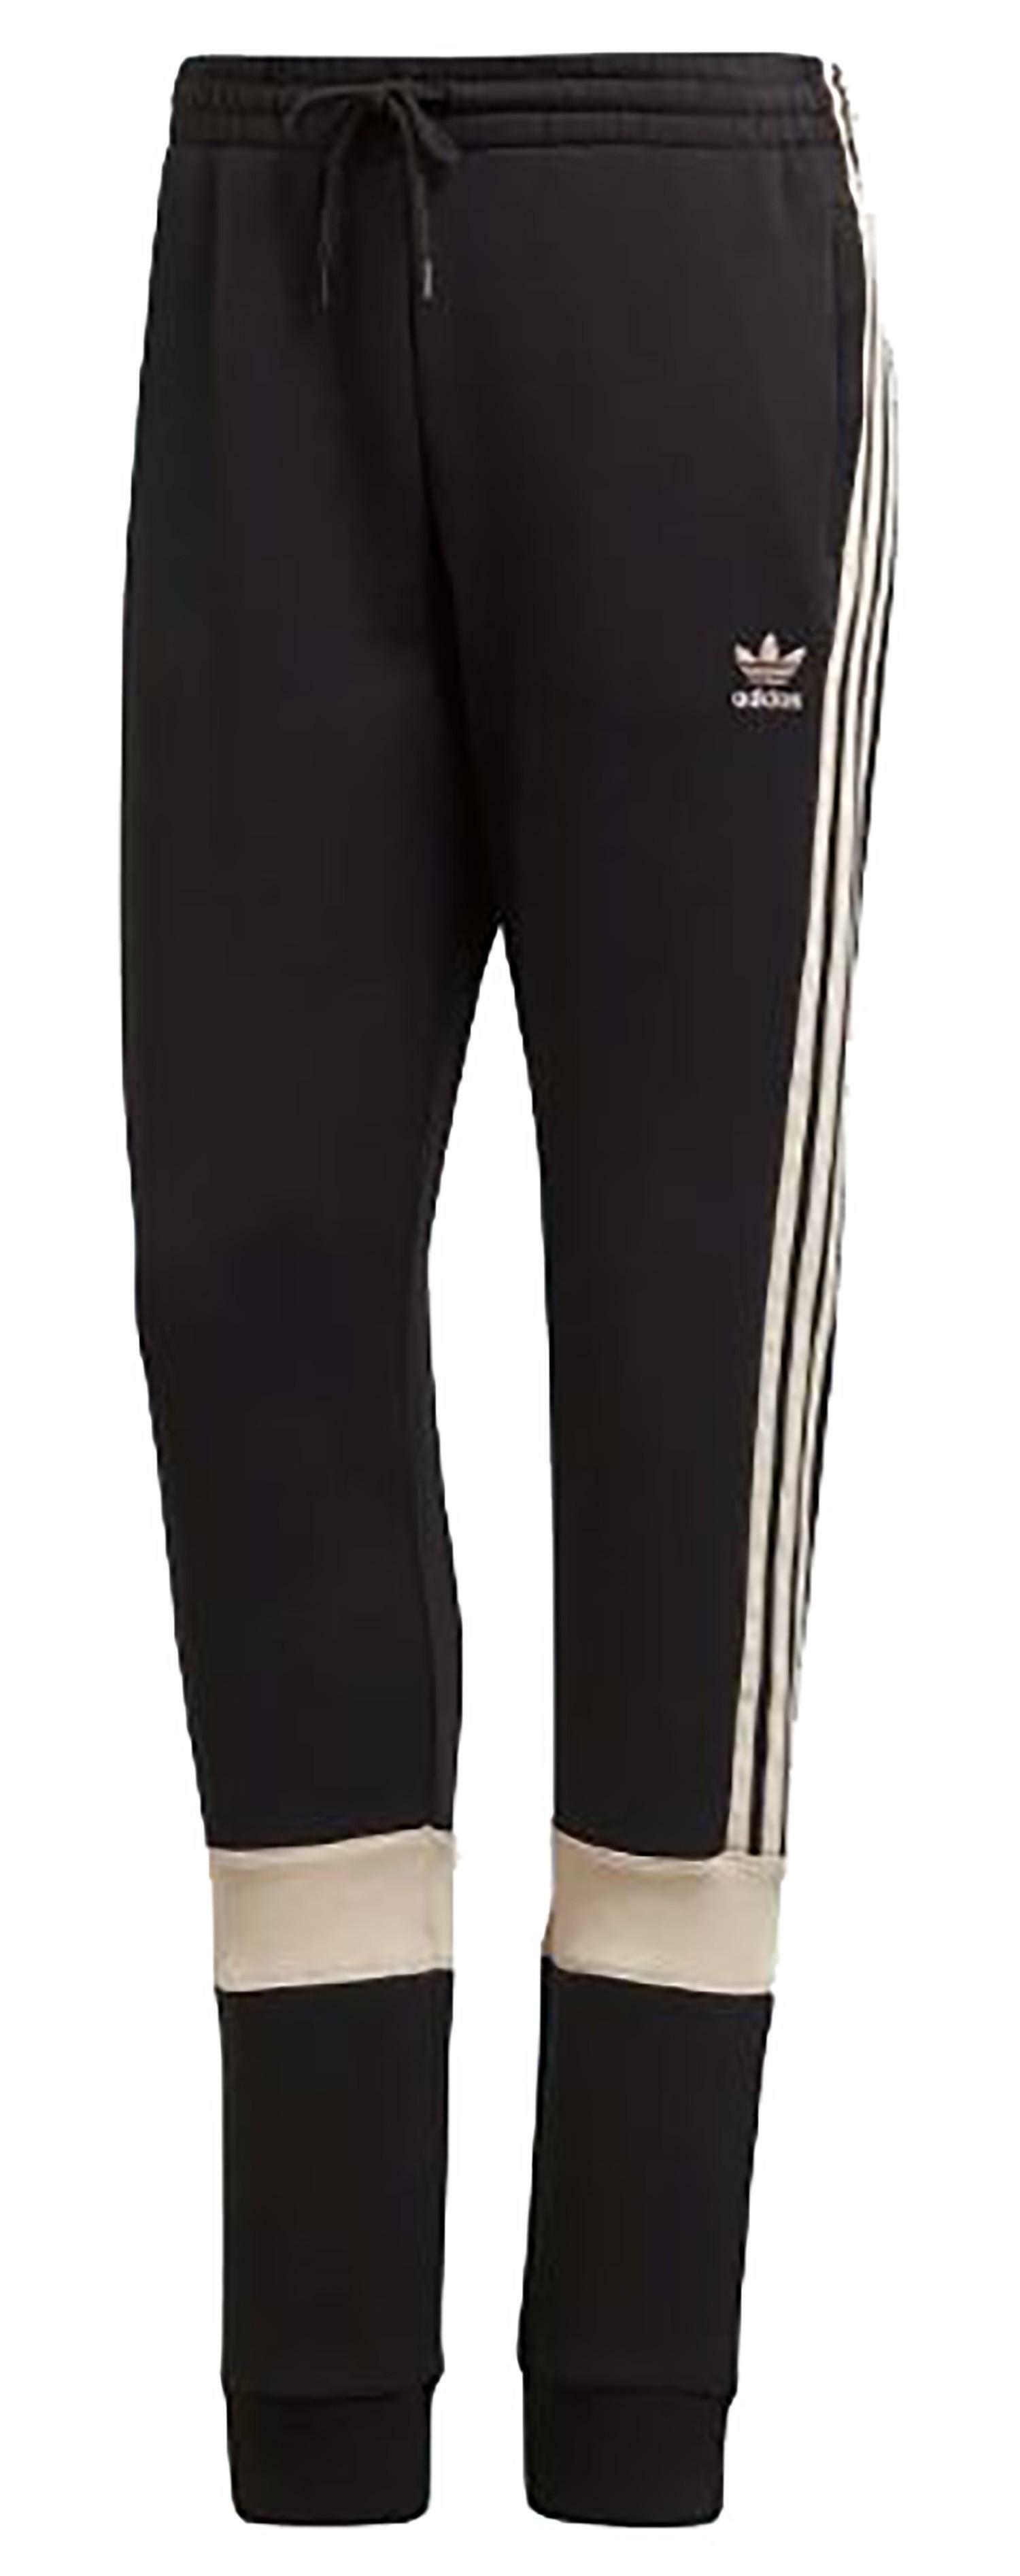 adidas adidas track pantaloni tuta donna neri dh4212